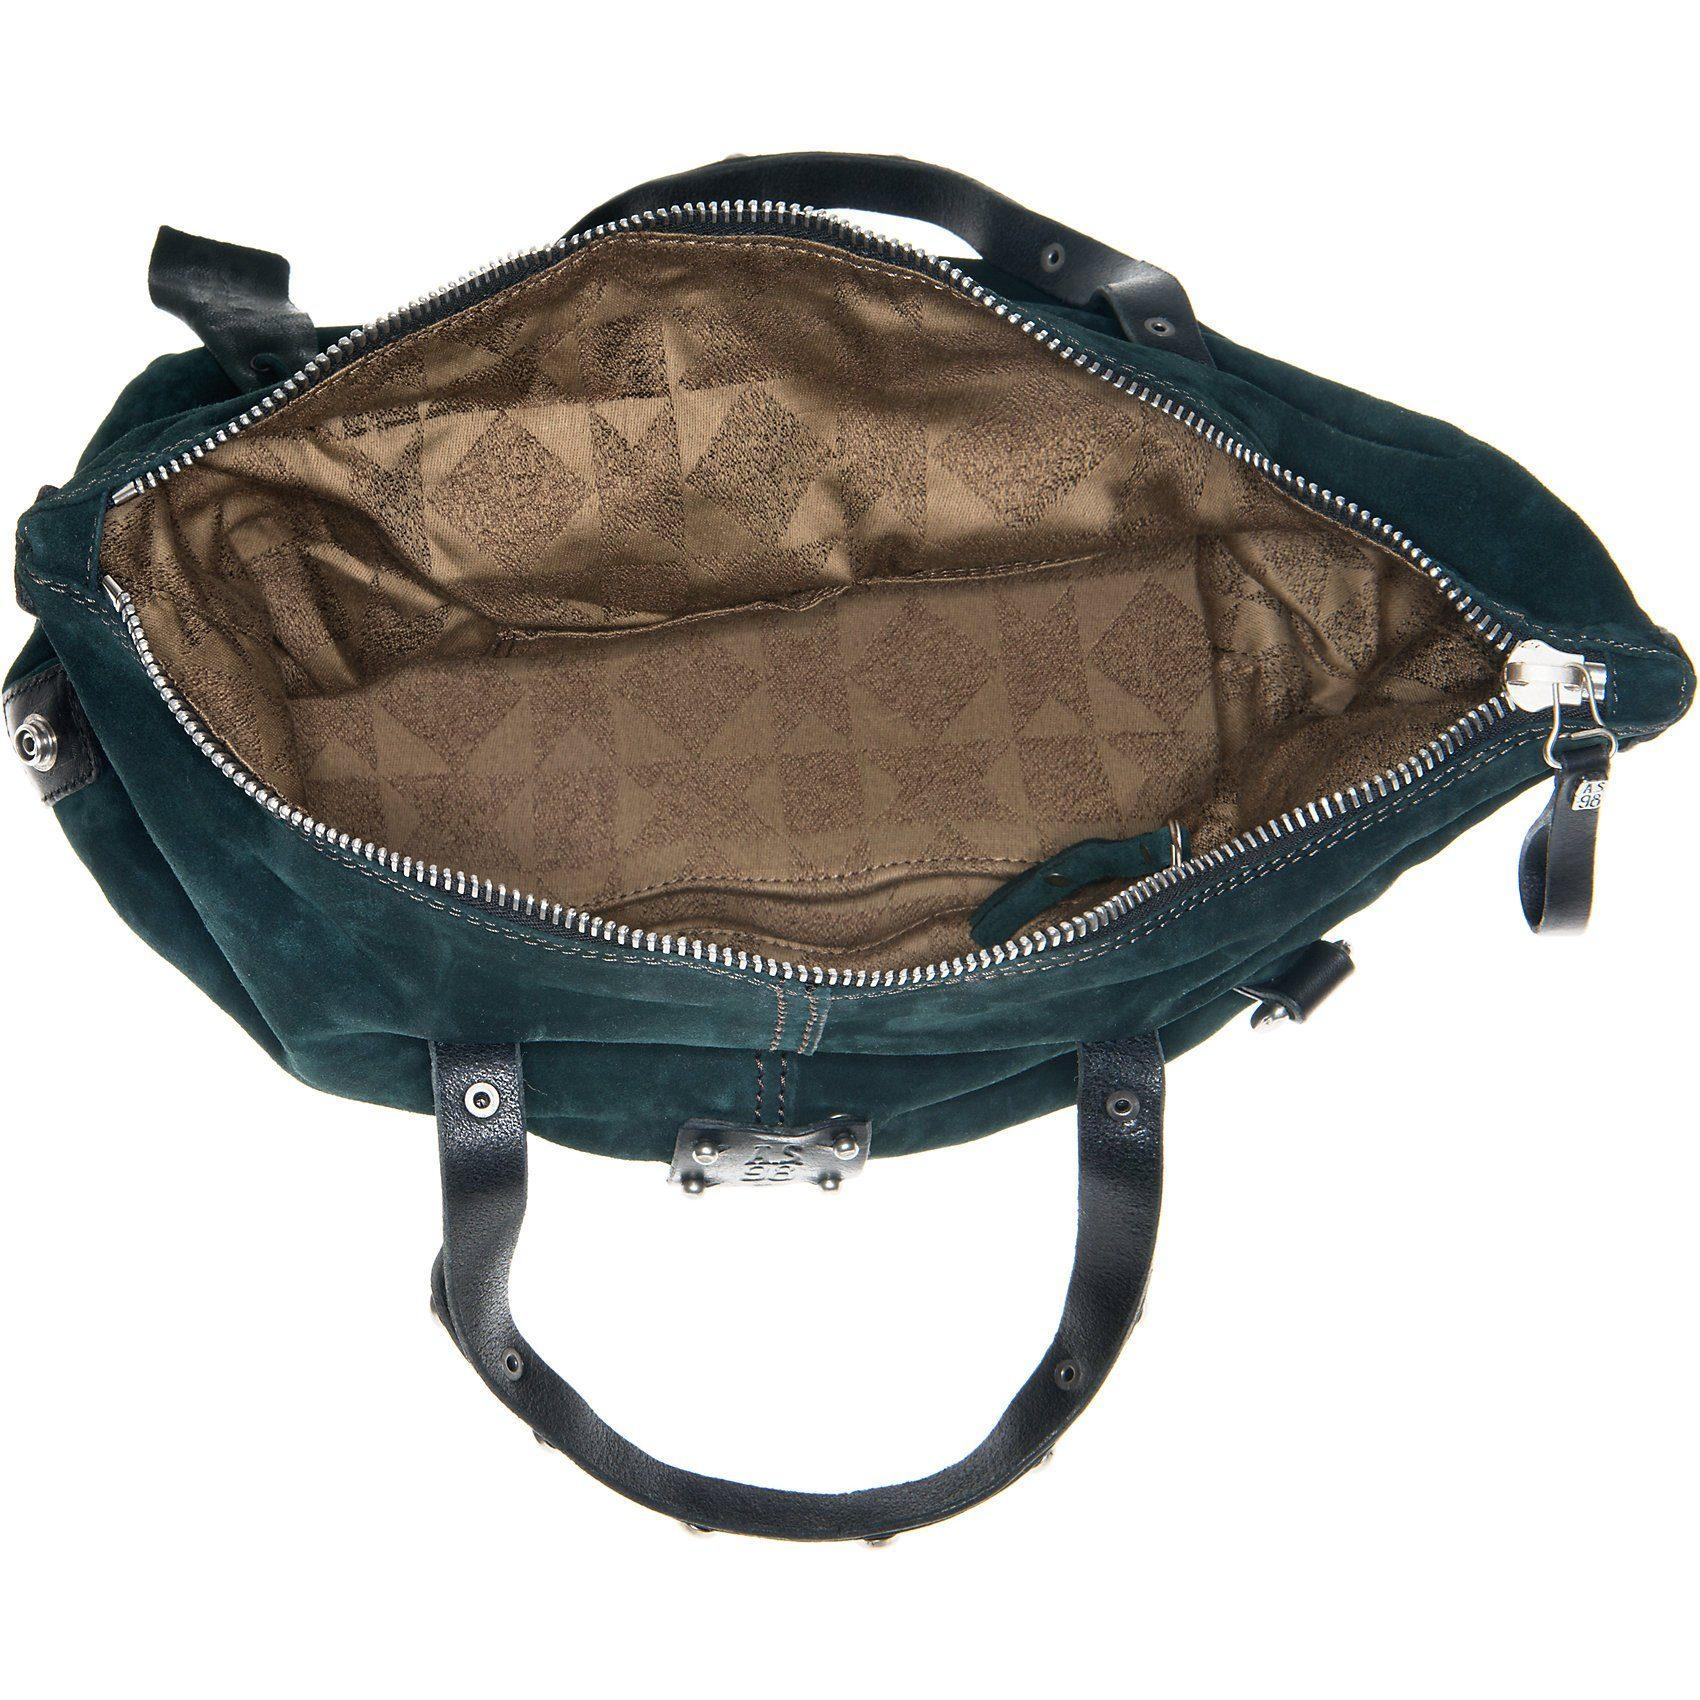 A.s.98 Handtaschen in Grün Lz3XG